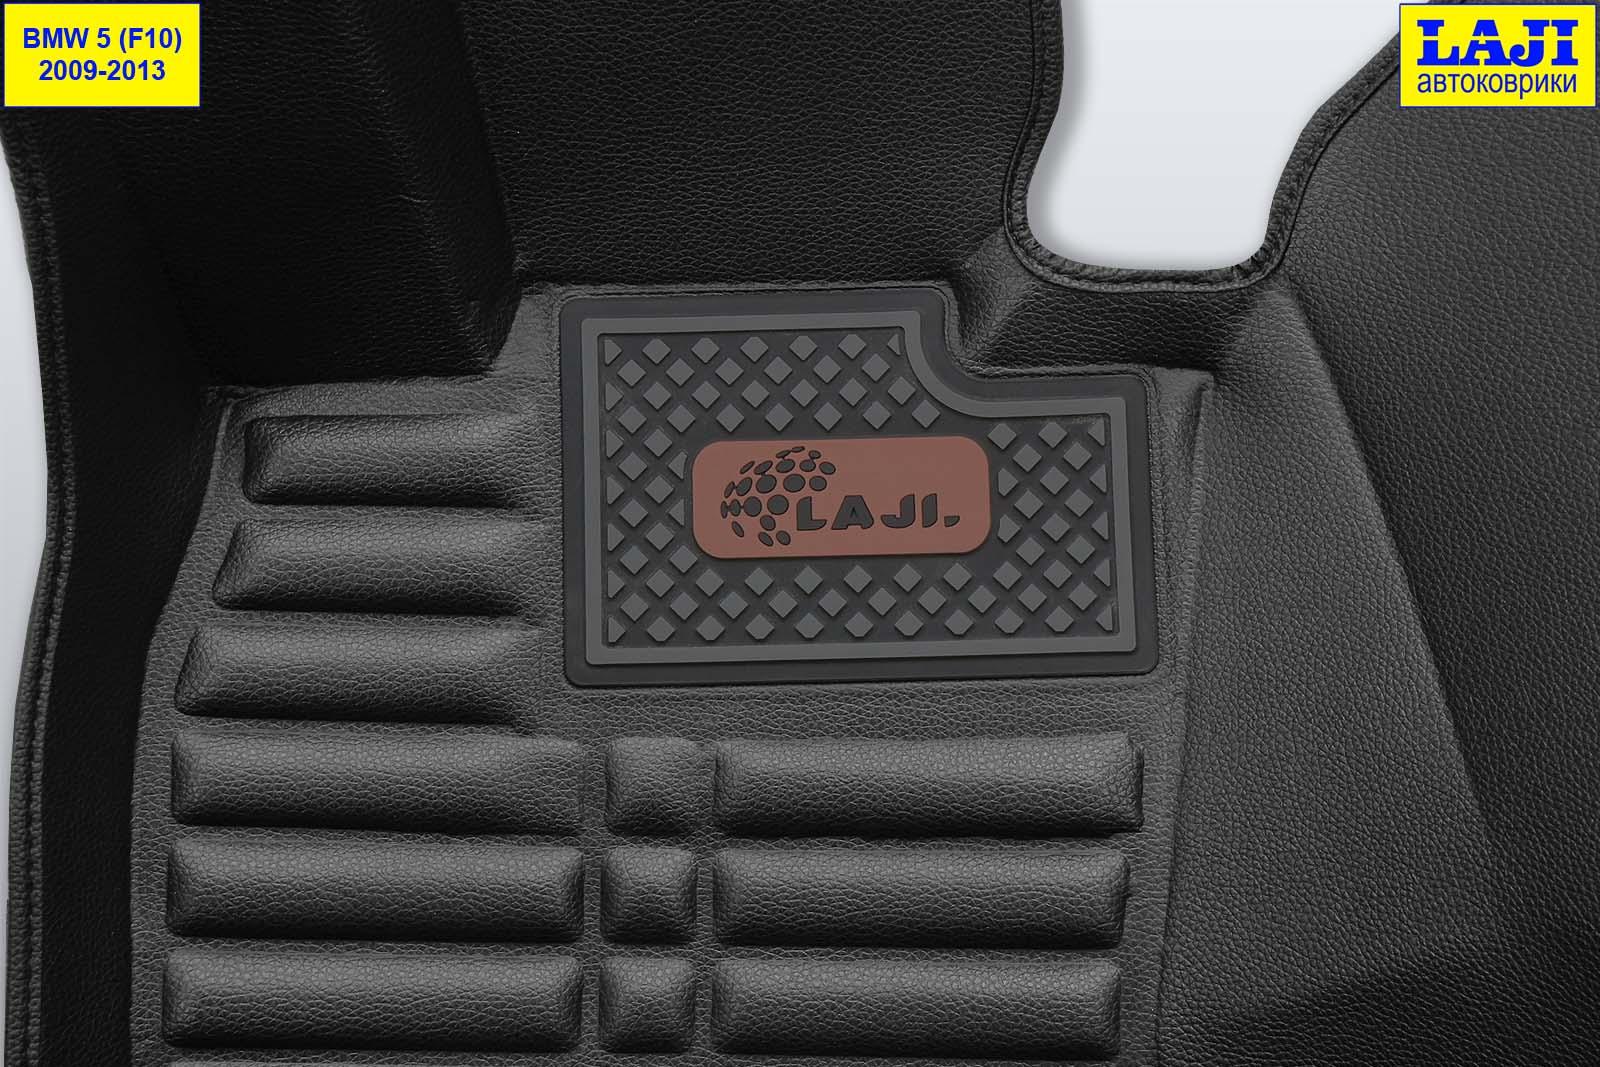 5D коврики в салон BMW 5 серии F10 2009-2013 7